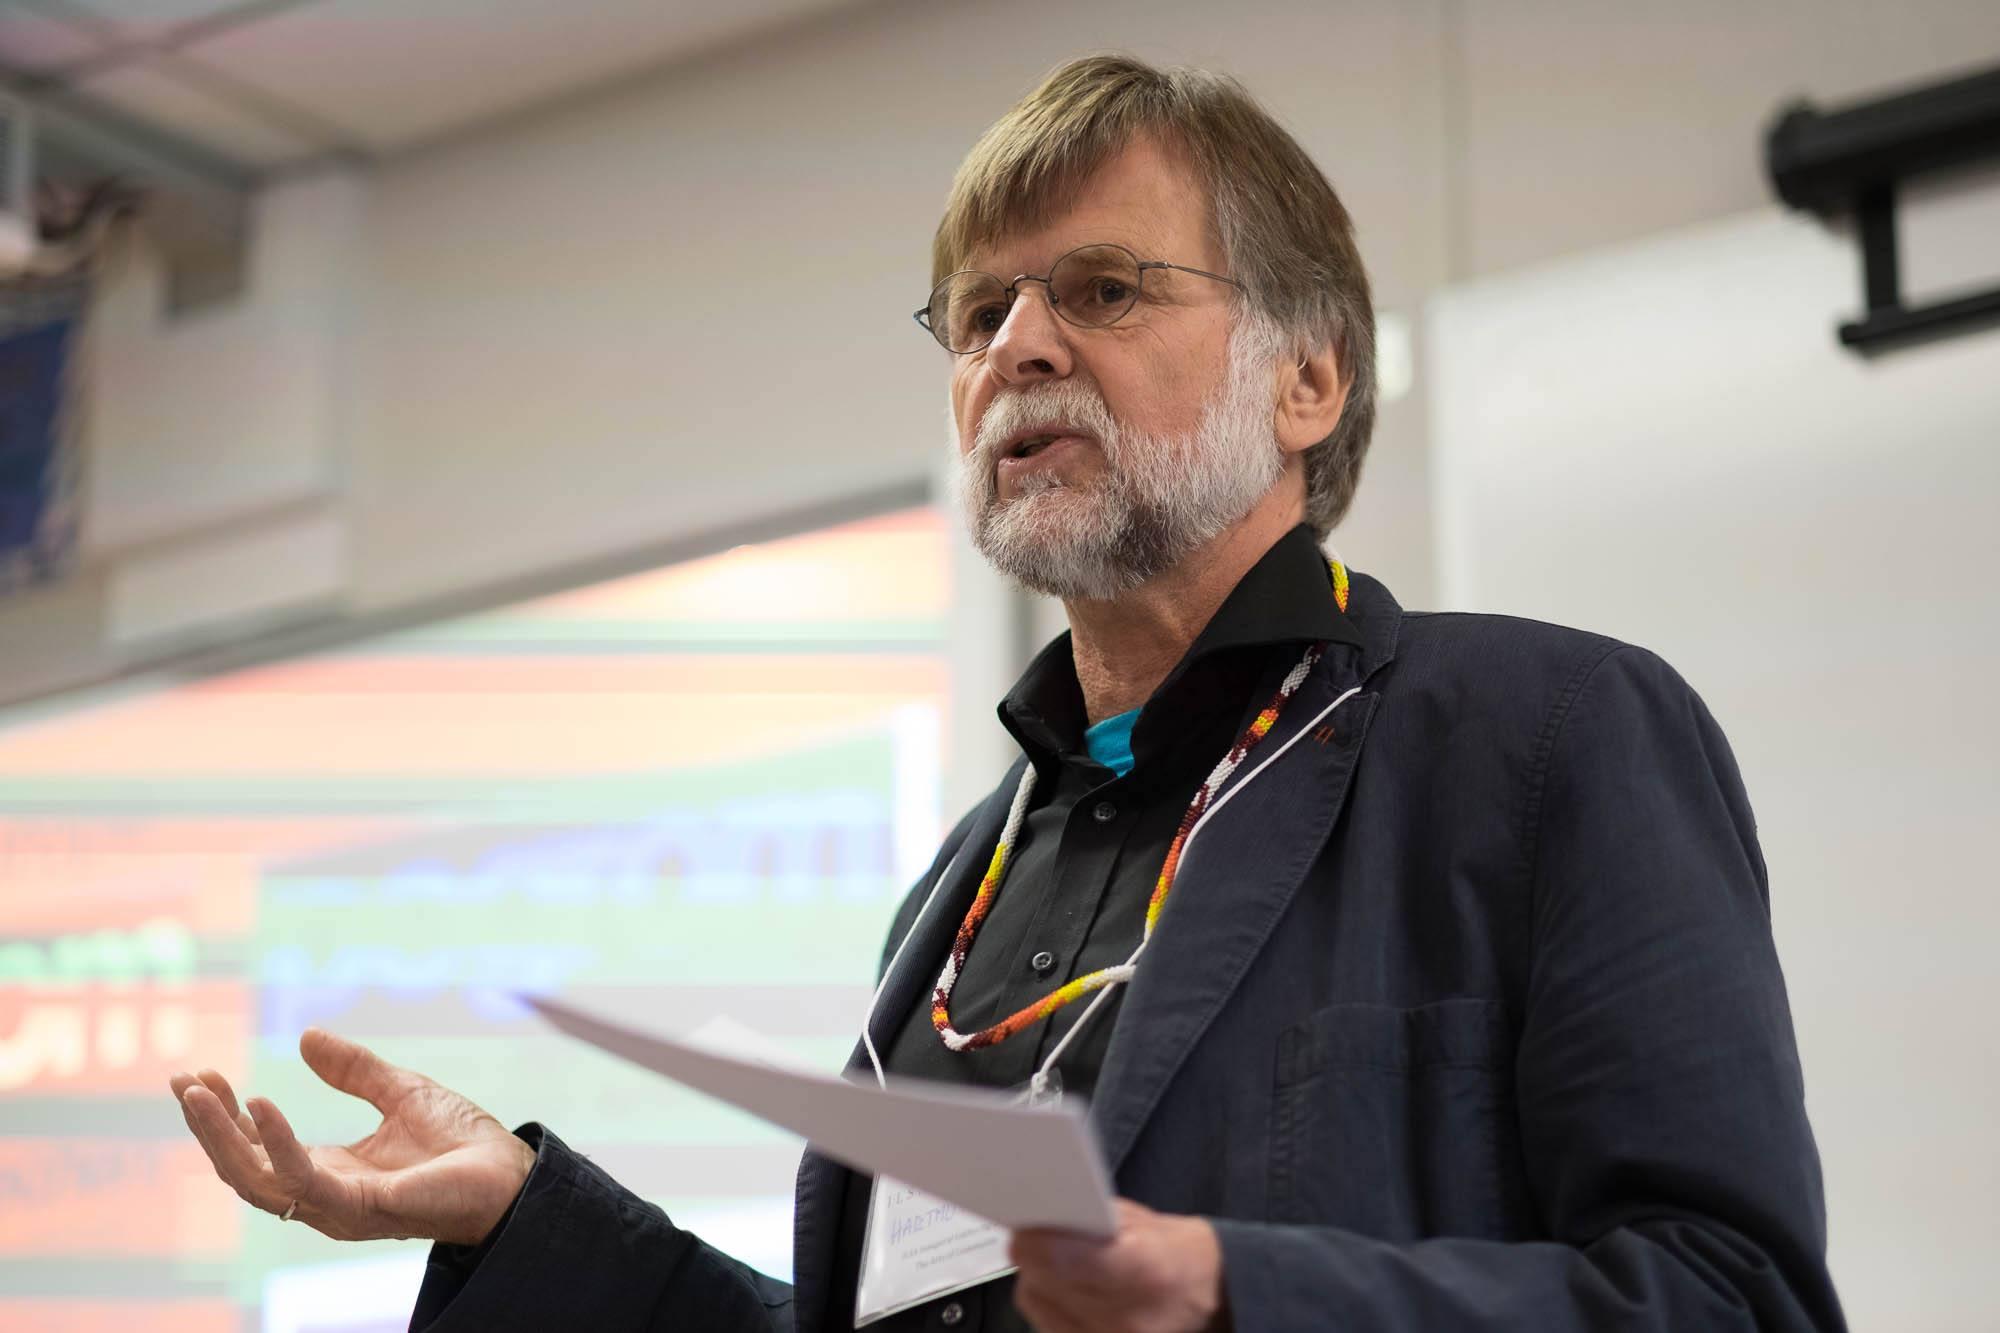 Professor Hartmut Lutz        photo: w. cariou